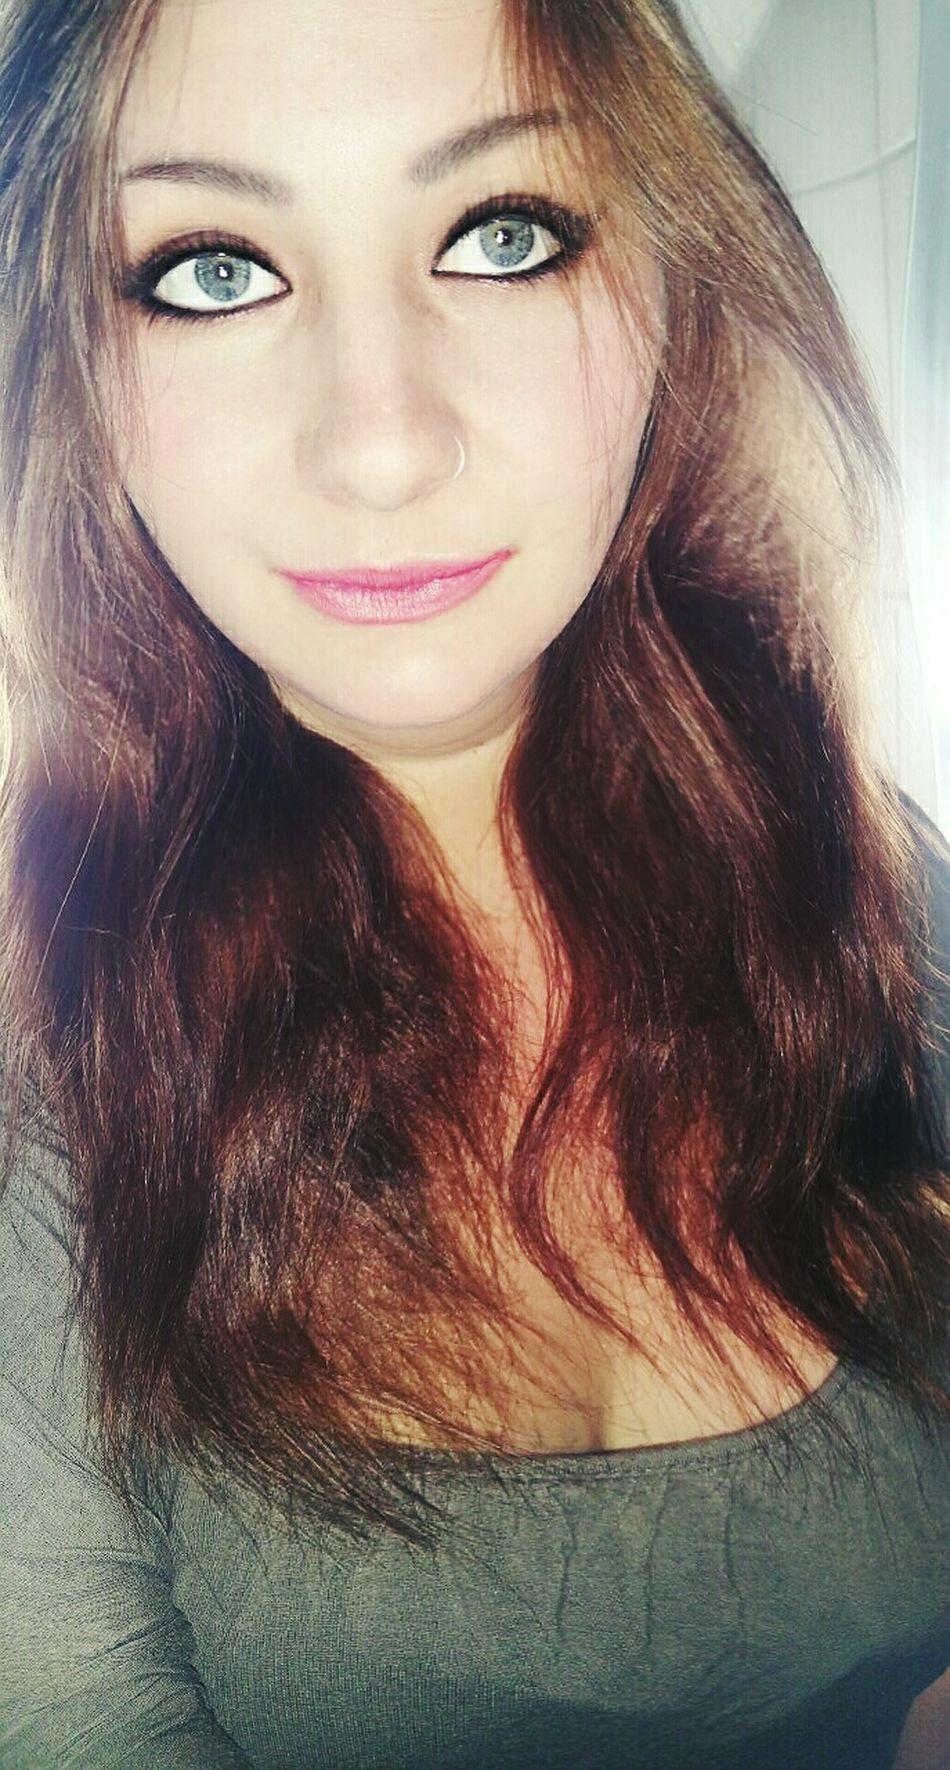 Smiling Happy Blue Eyes Long Hair Pinklipstick Dreaming Follow_me FollowMeOnInstagram Likeback Pleasefollow Guter Start In Den Tag  Lovetime Summertime Photography Photographylovers Instapic Follwforfollow Instaday Instagramer Like4like Inmemories Loveit Instadaily Instagood Instaphoto